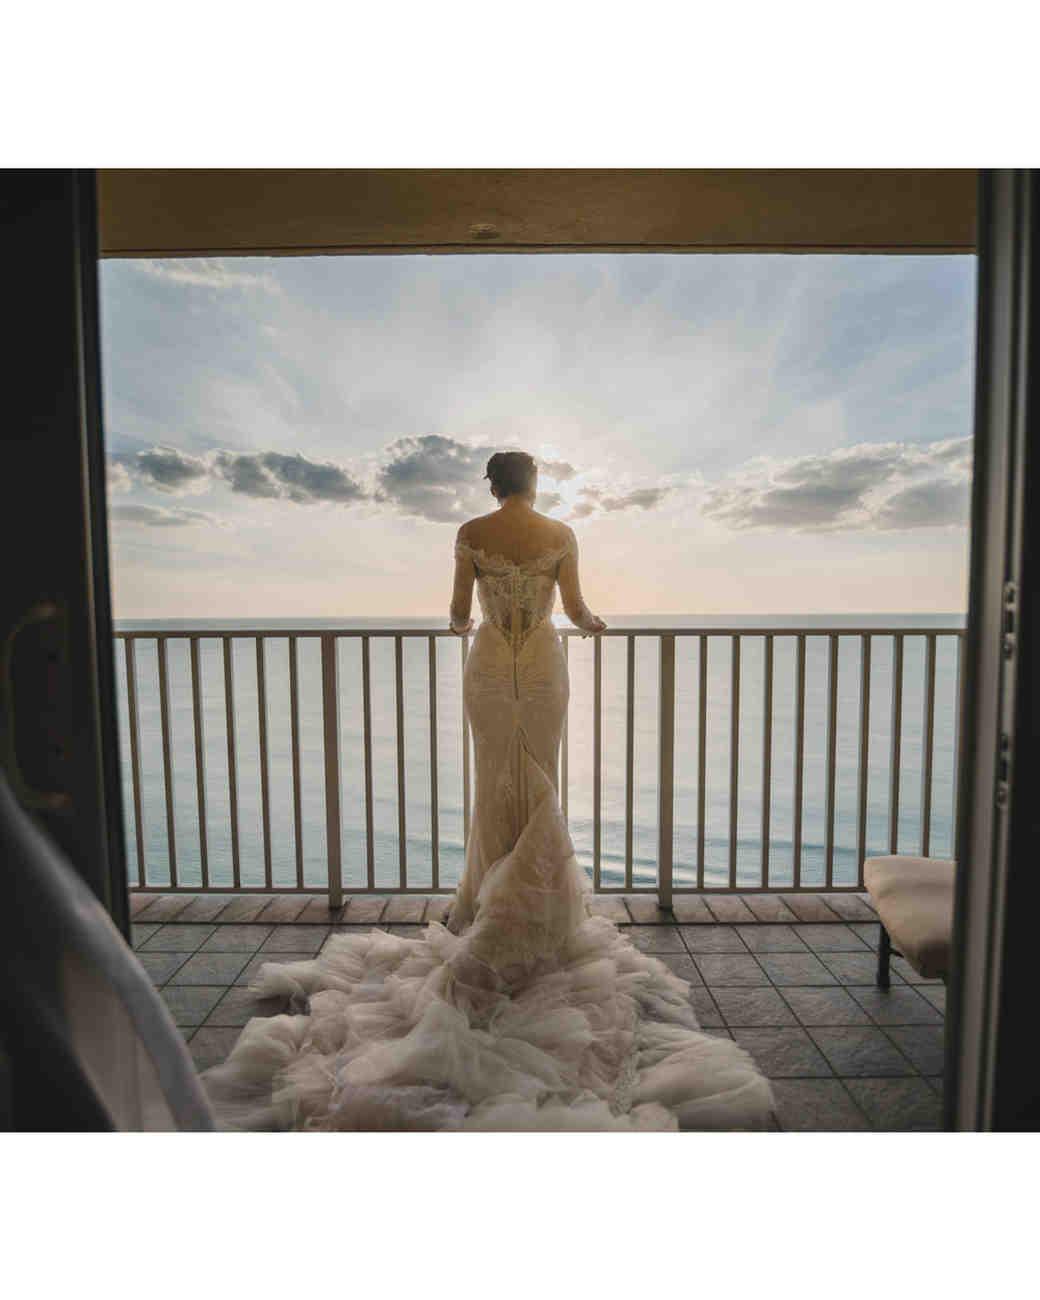 wedding-day-photography-tips-5-0216.jpg